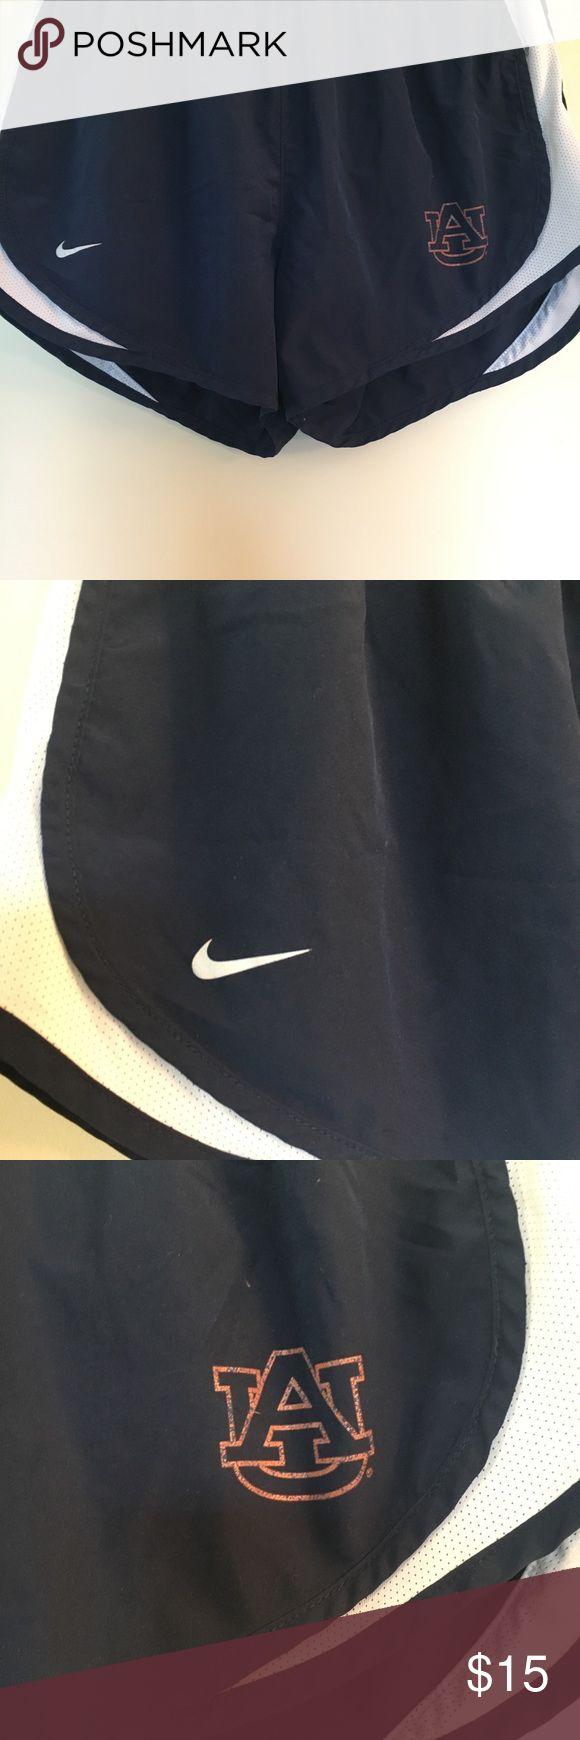 "Nike Shorts Auburn University size small ~NO TRADES~ Auburn University Nike shorts. Navy blue with an orange ""AU"" printed on the side. Size small Nike Shorts"